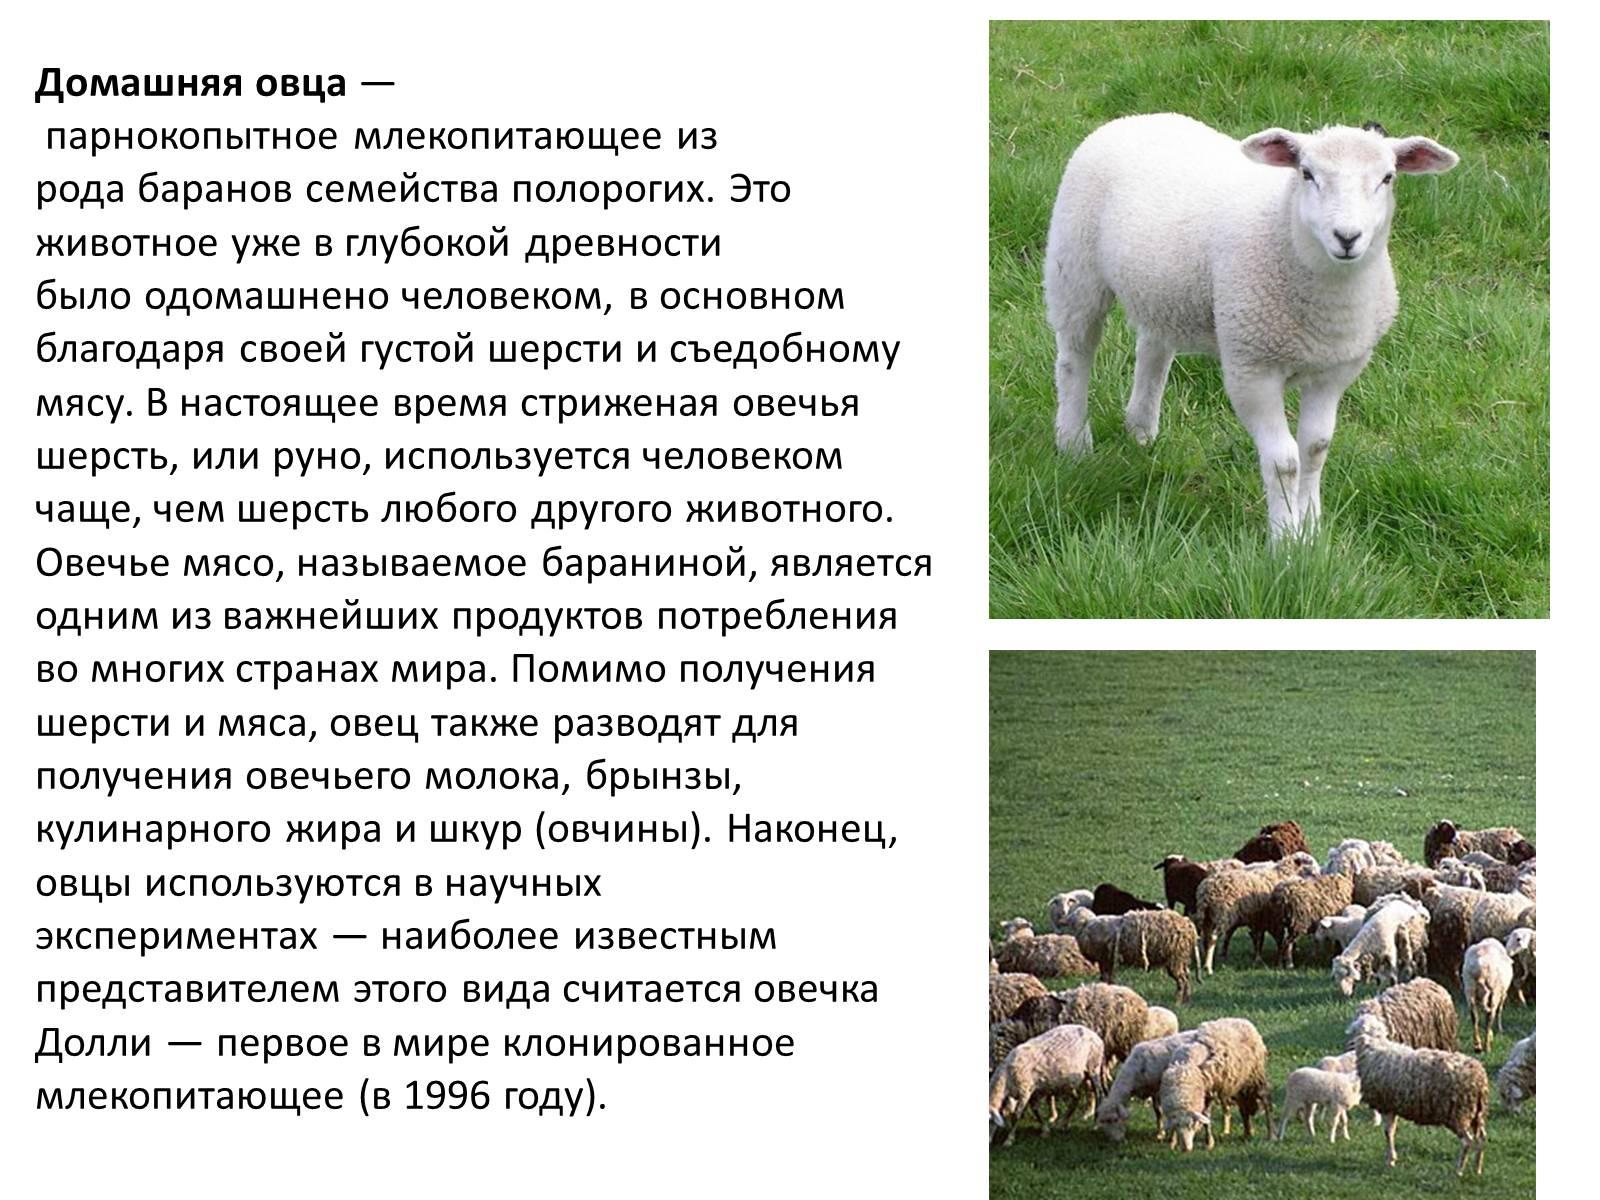 Что дает овца?